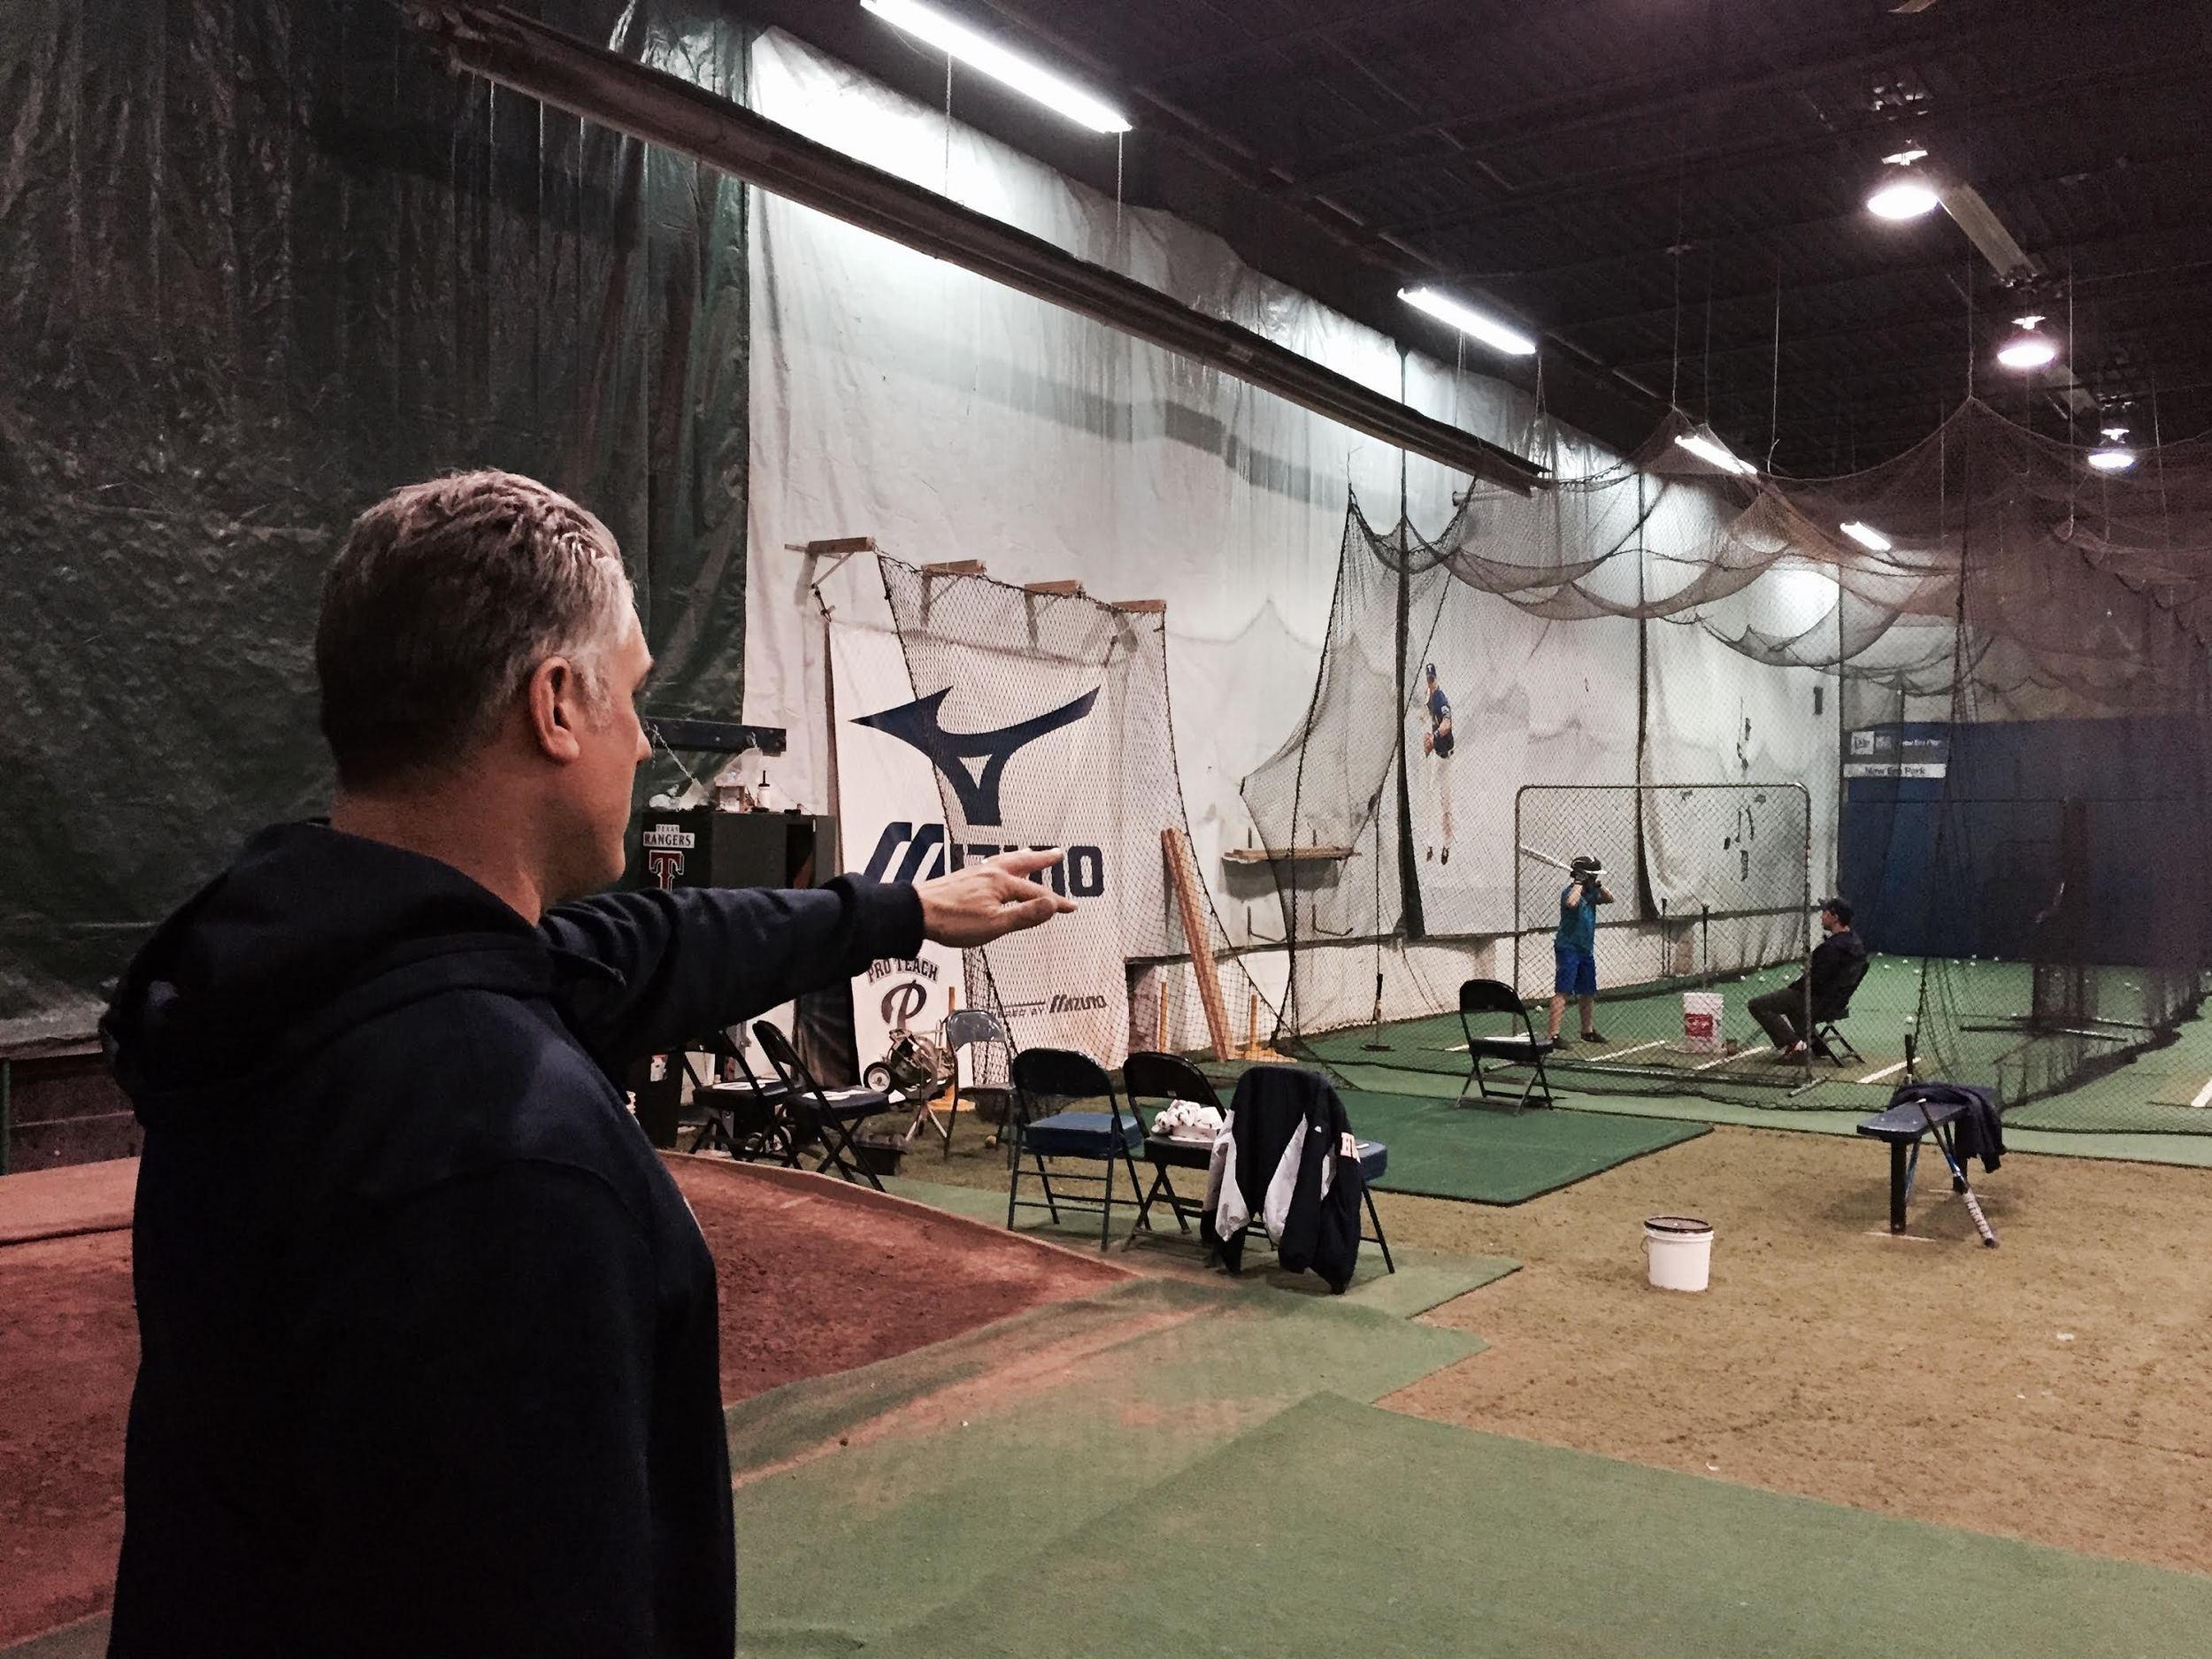 Denny Berni shows of his Pro Teach facility in Etobicoke. (Tyler King/CBN)